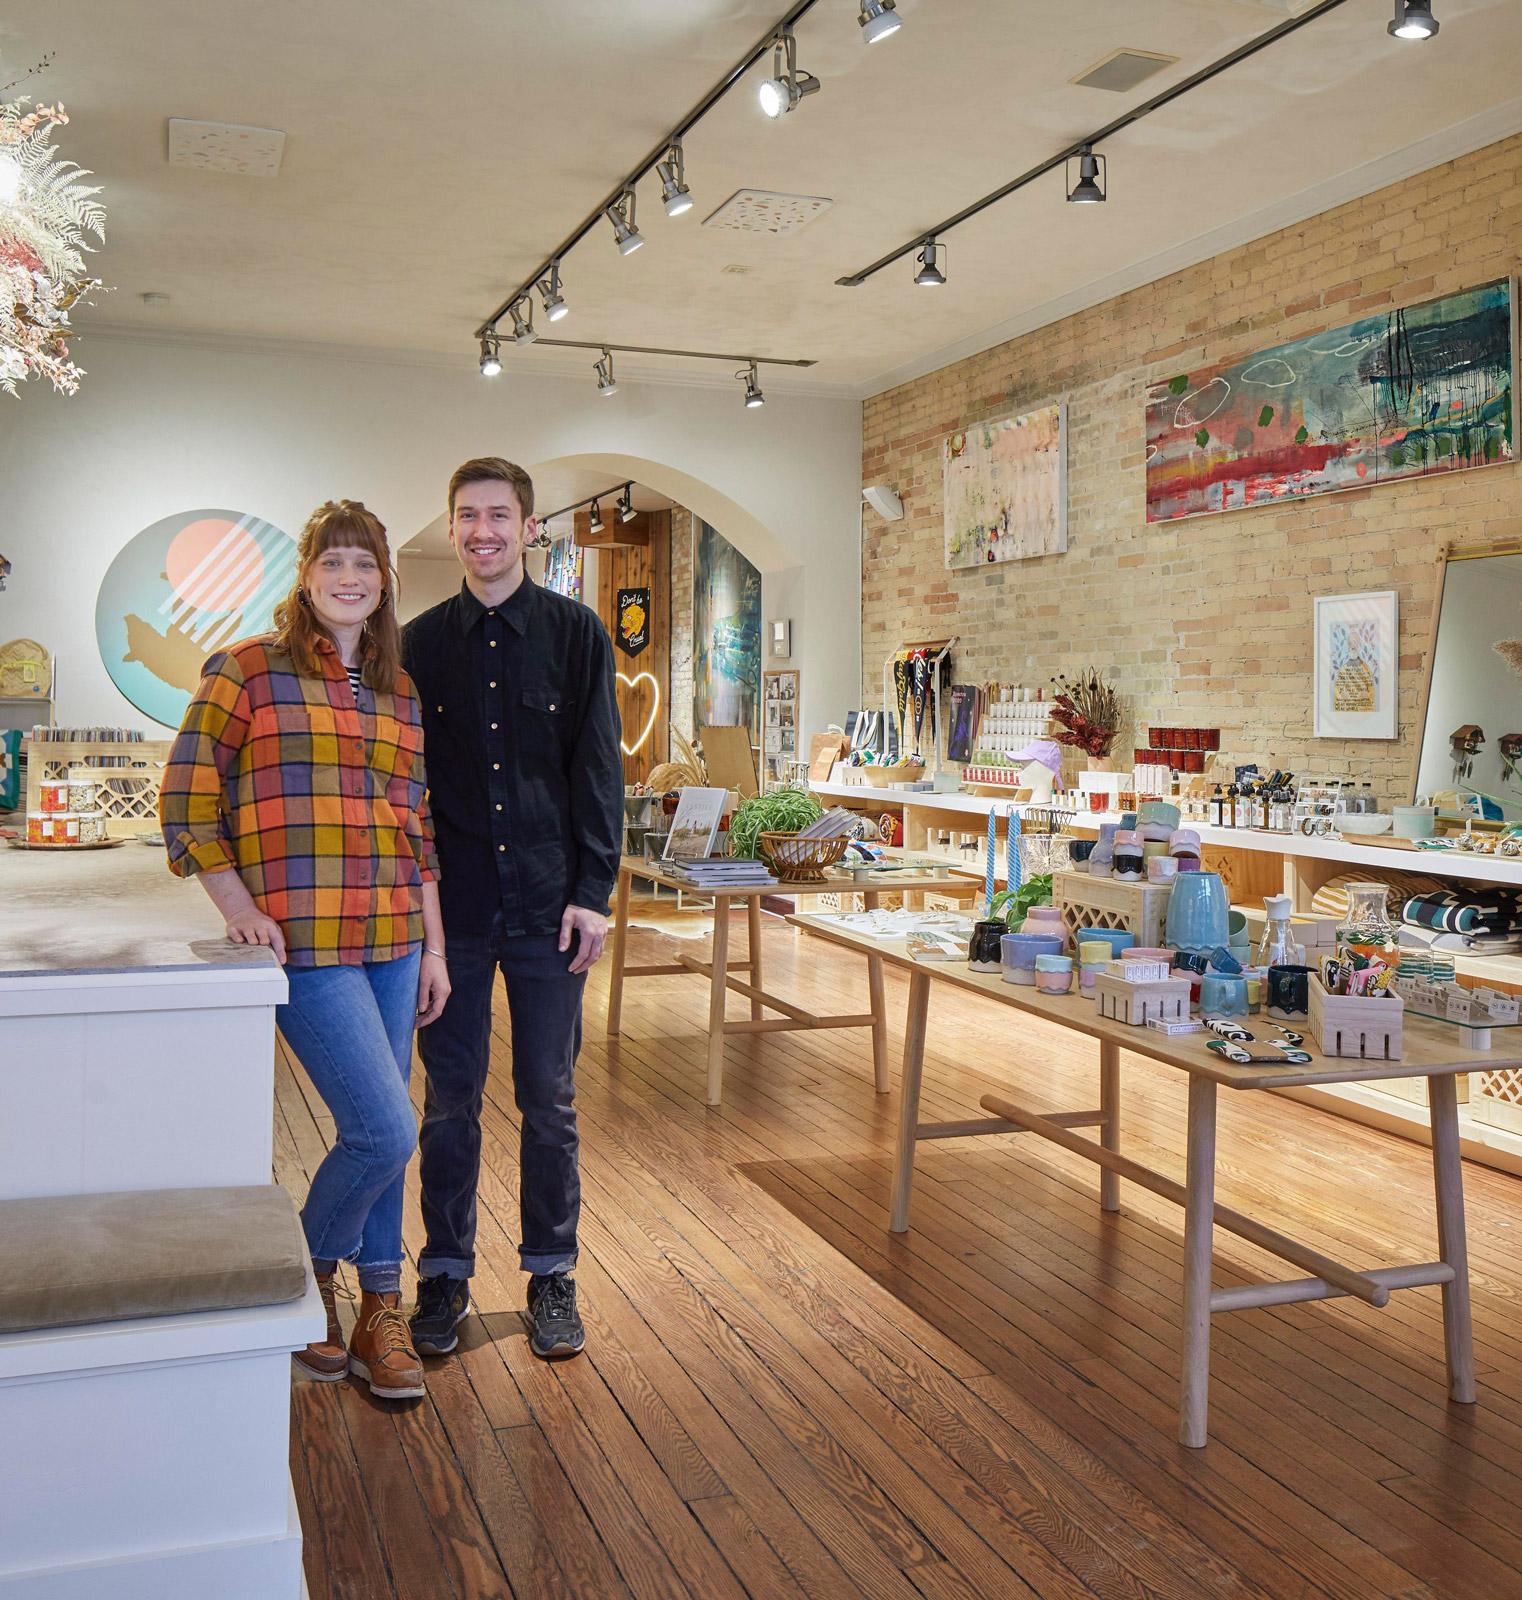 Jordan Gottsacker home and shop